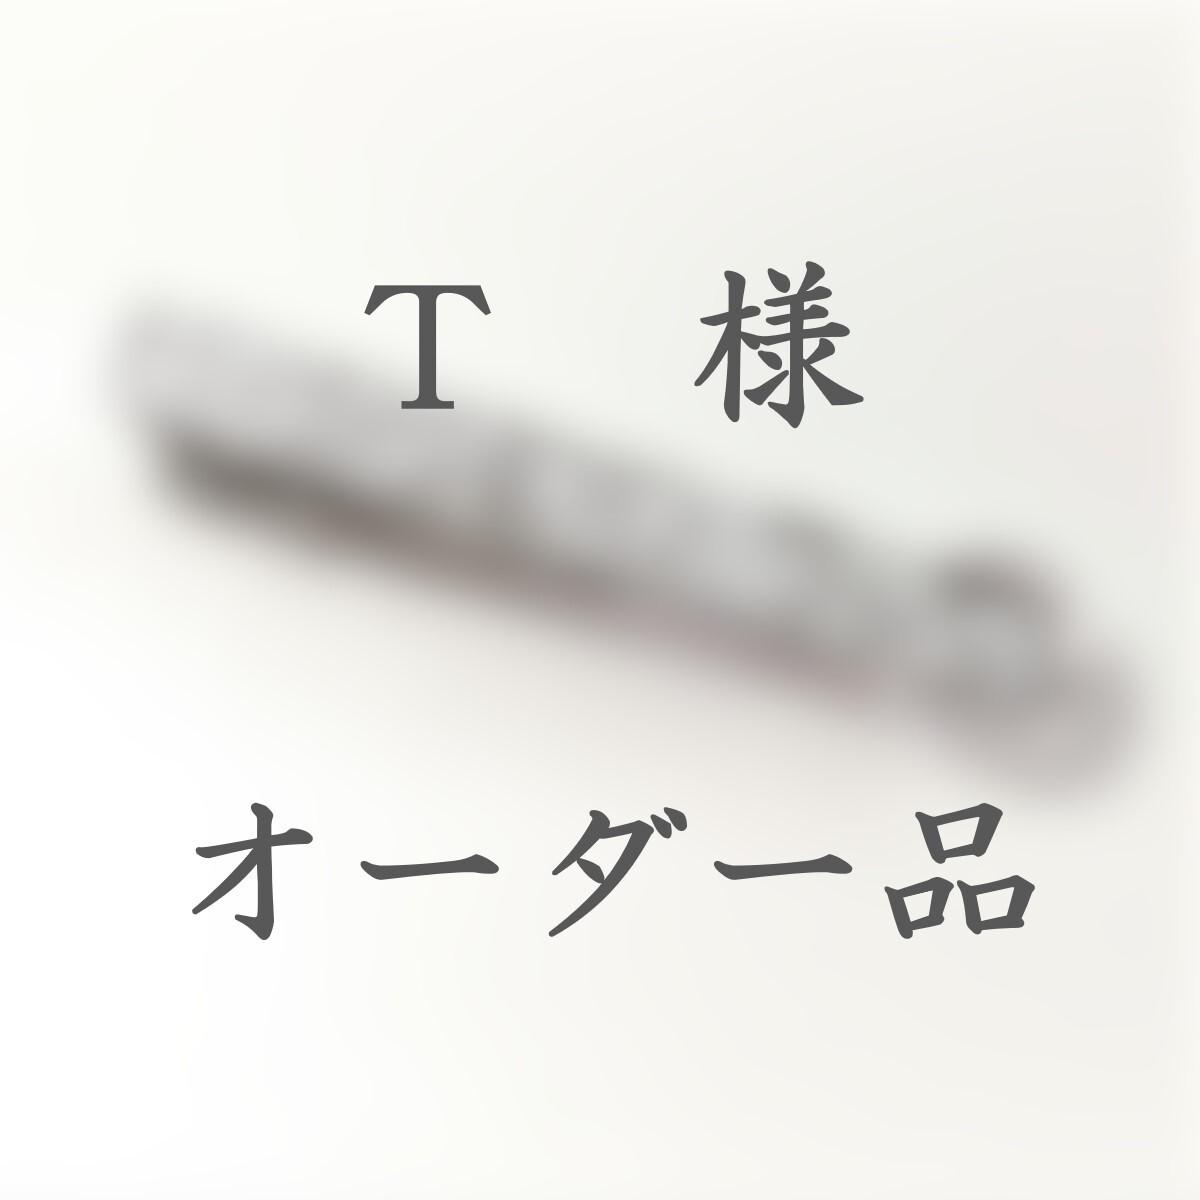 ☆T様オーダー品☆ (タイピン&ネックレス)